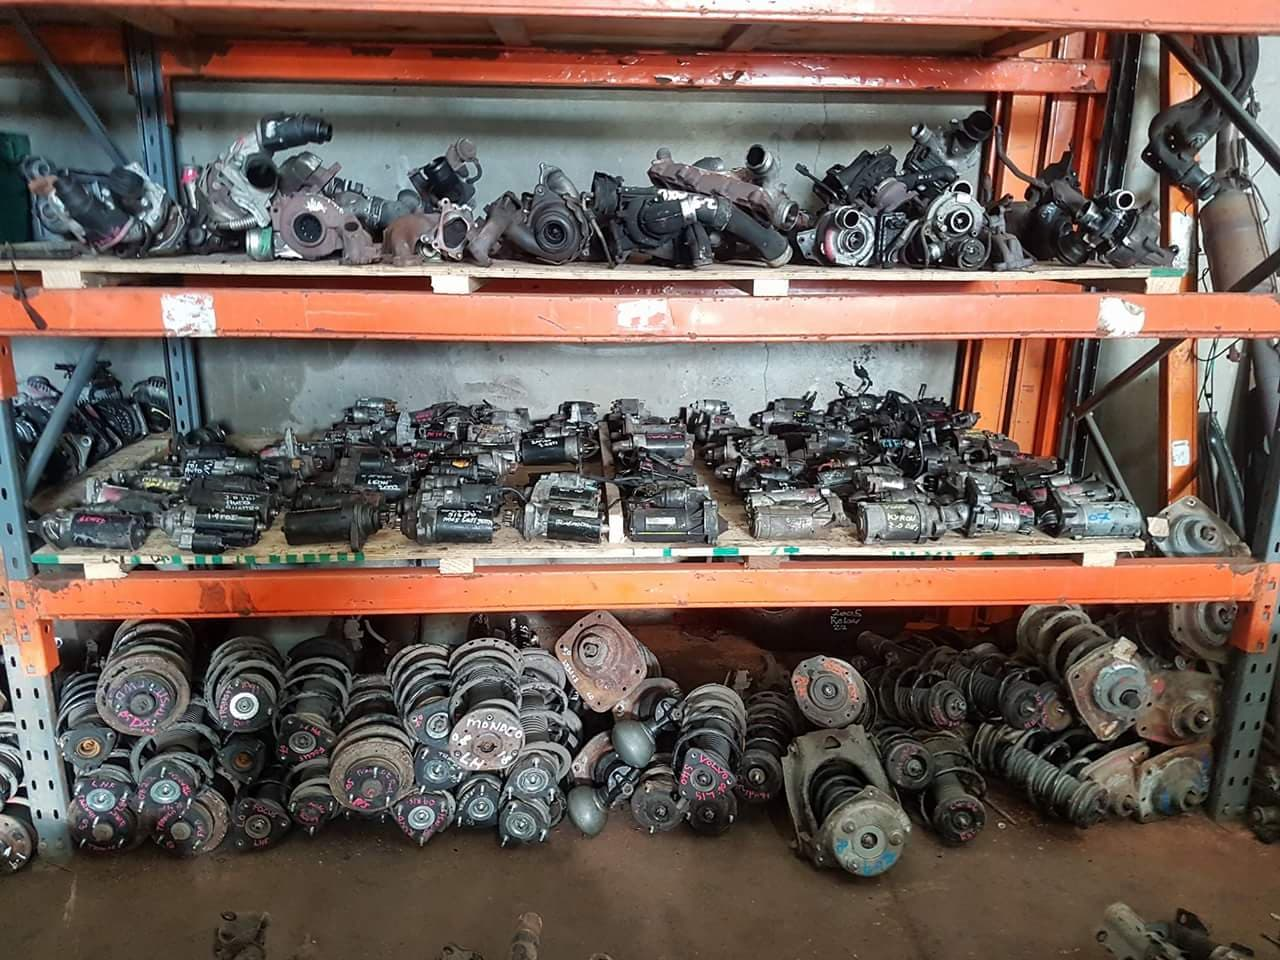 Electromotoare pentru diverse masini: opel, volkswagen,mercedes, fiat,etc